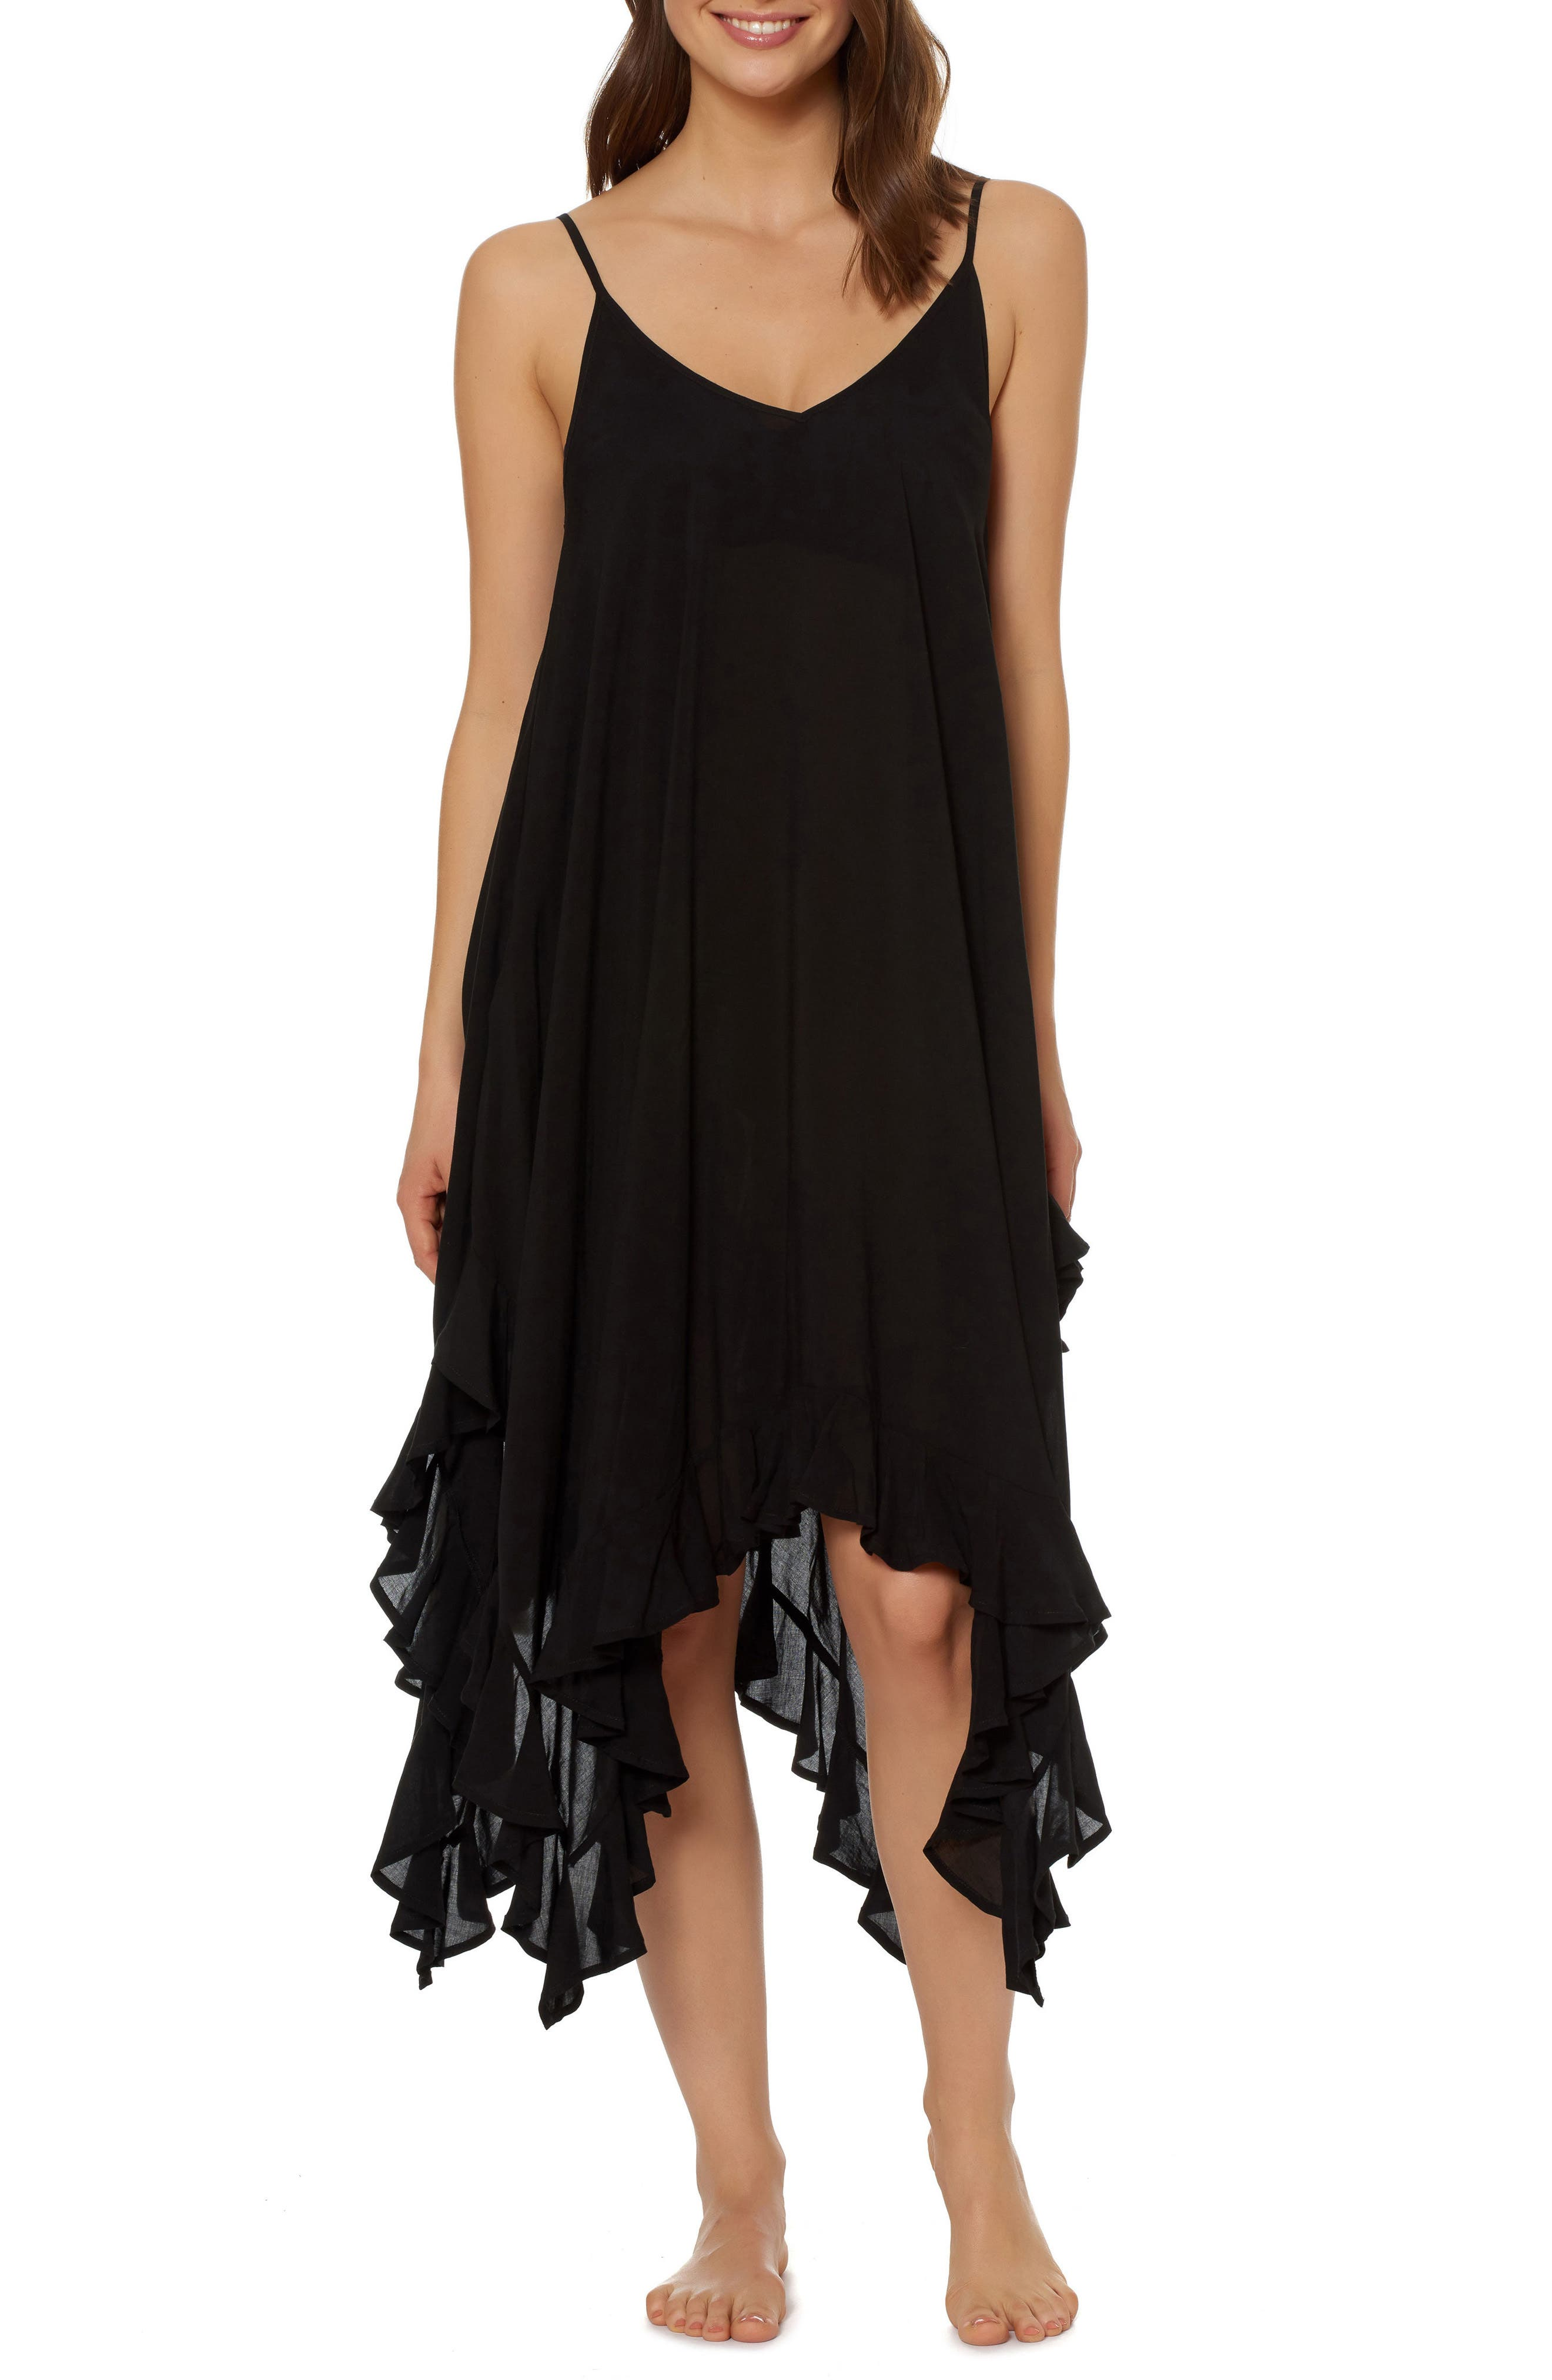 BLEU by Rod Beattie Handkerchief Hem Cover-Up Dress,                             Main thumbnail 1, color,                             001